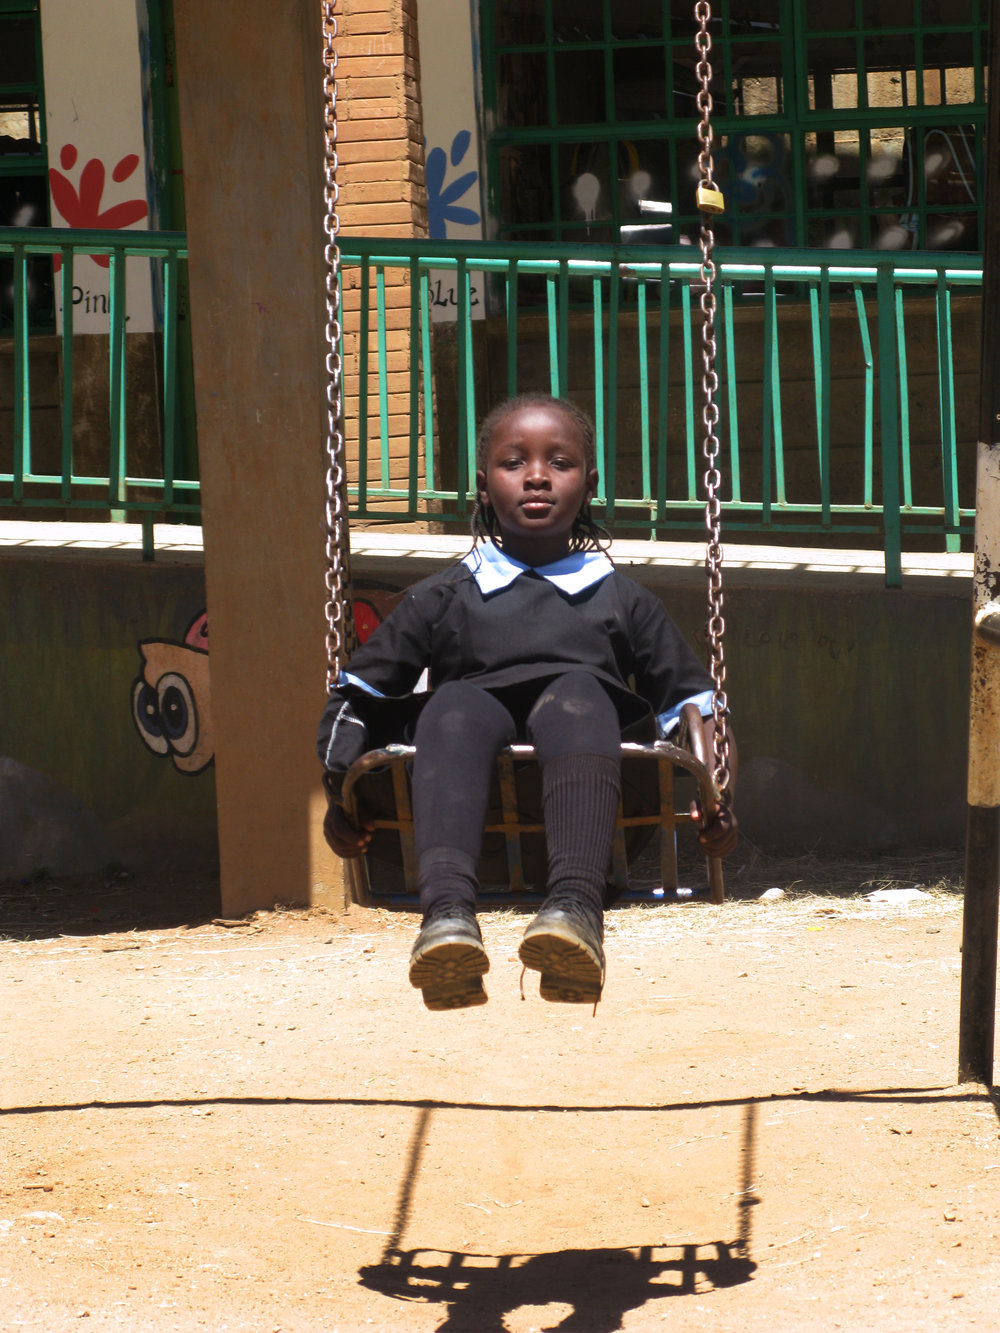 Nairobi_0006.JPG